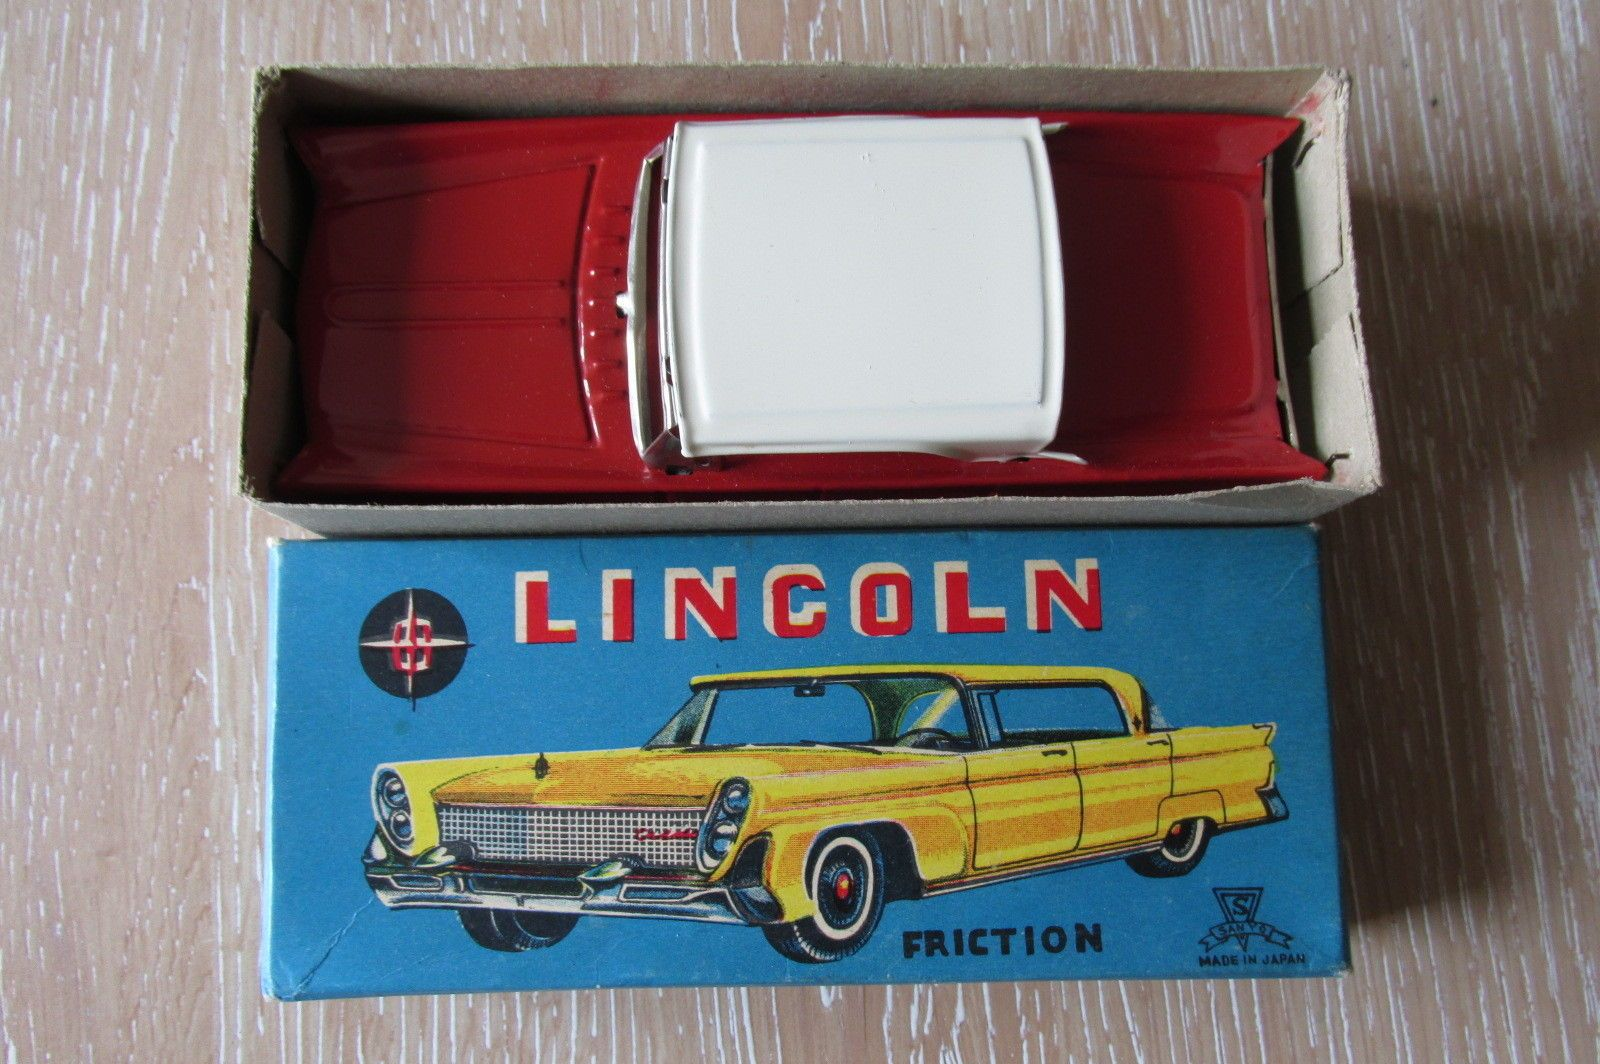 SANYO - Japan Tinplate Friction - Lincoln Saloon Car - Boxed | eBay